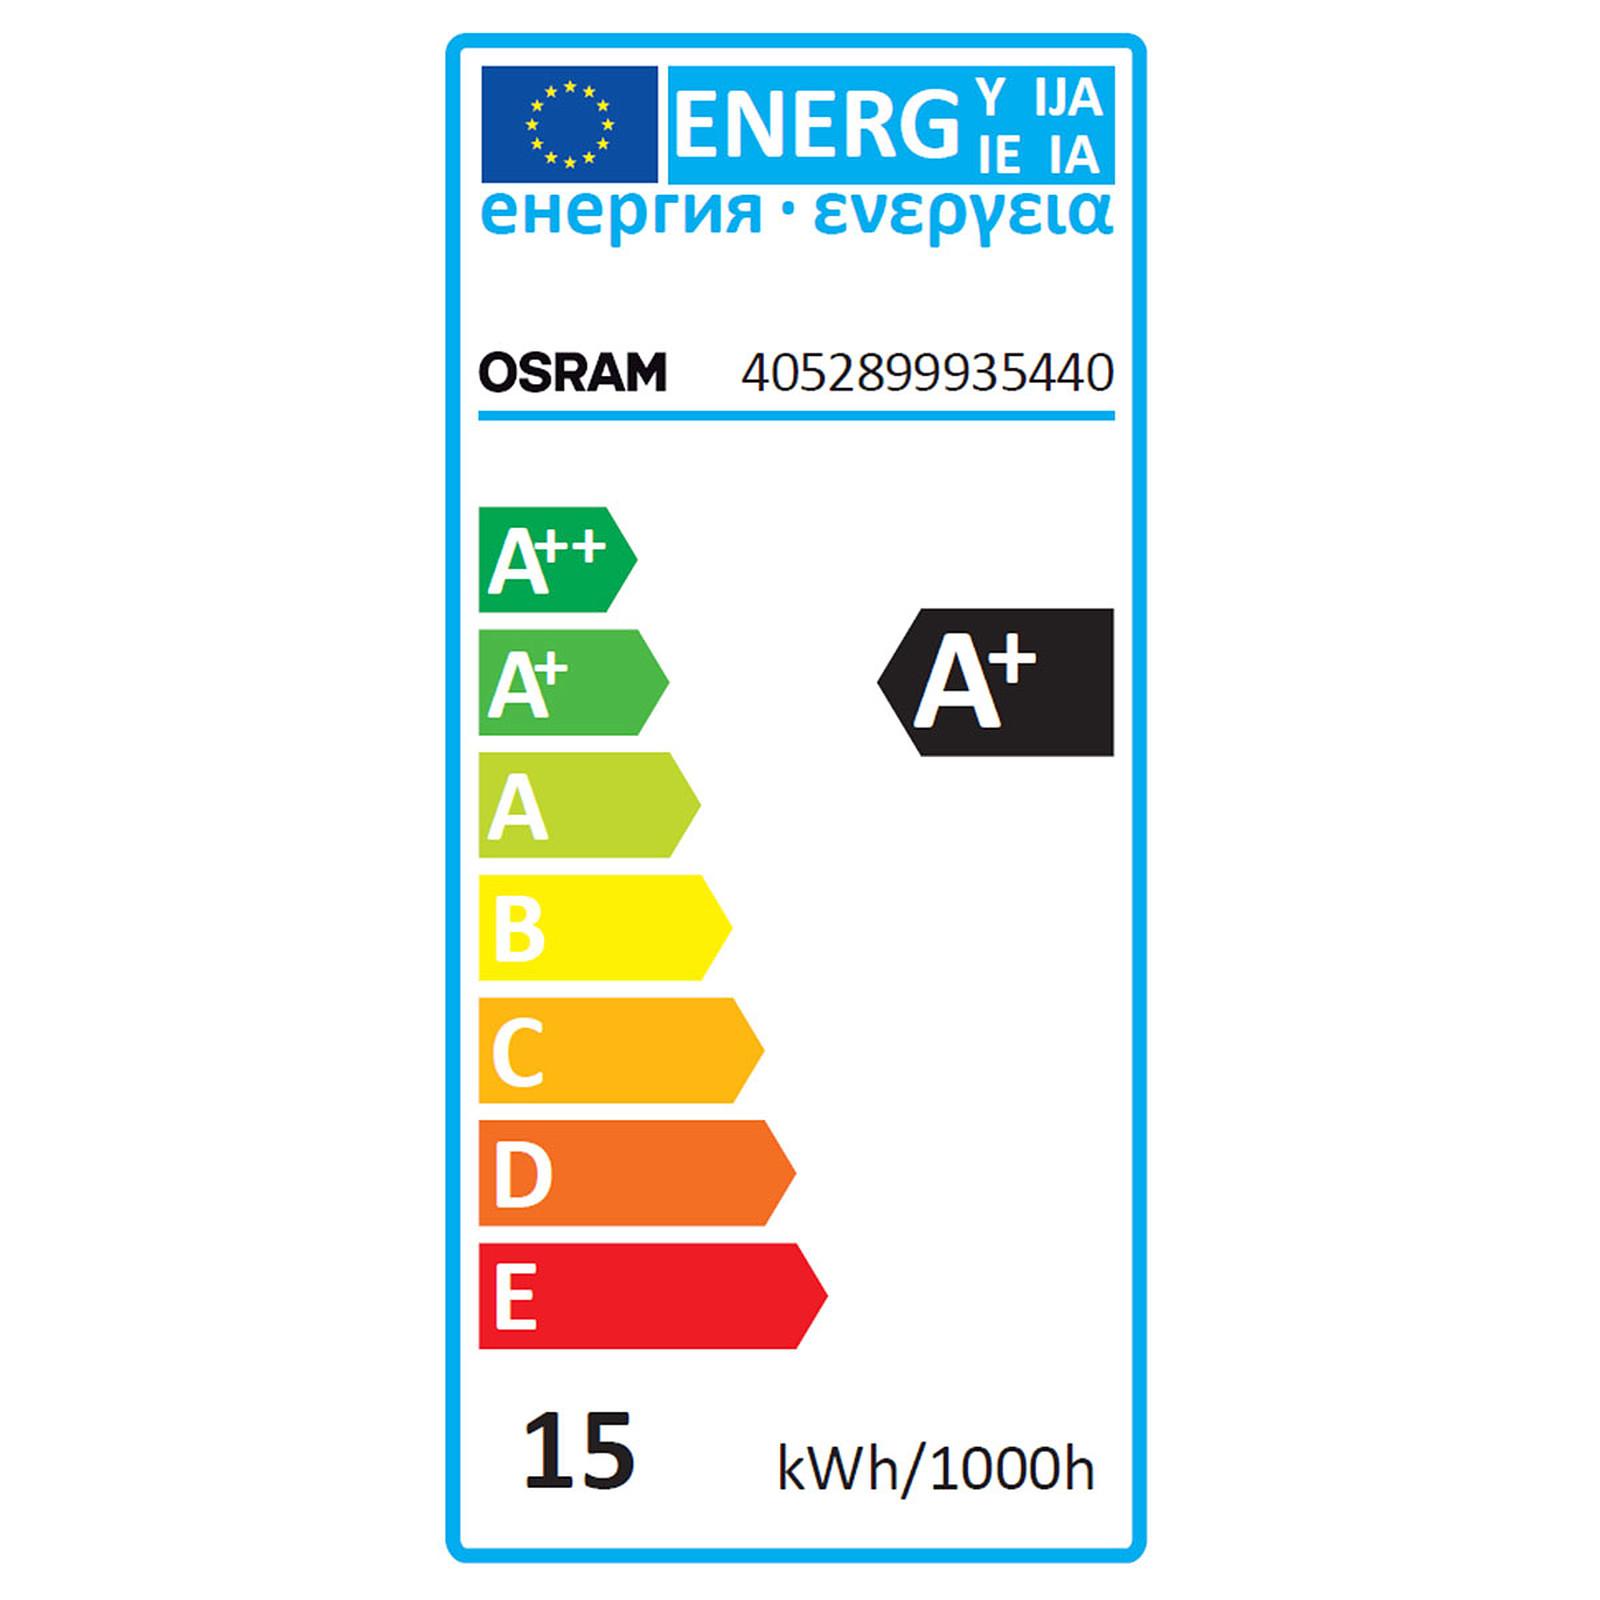 Osram 14 E27 Classic 5w100wA Superstar Standard Ampoule Led cS4Lq3jA5R